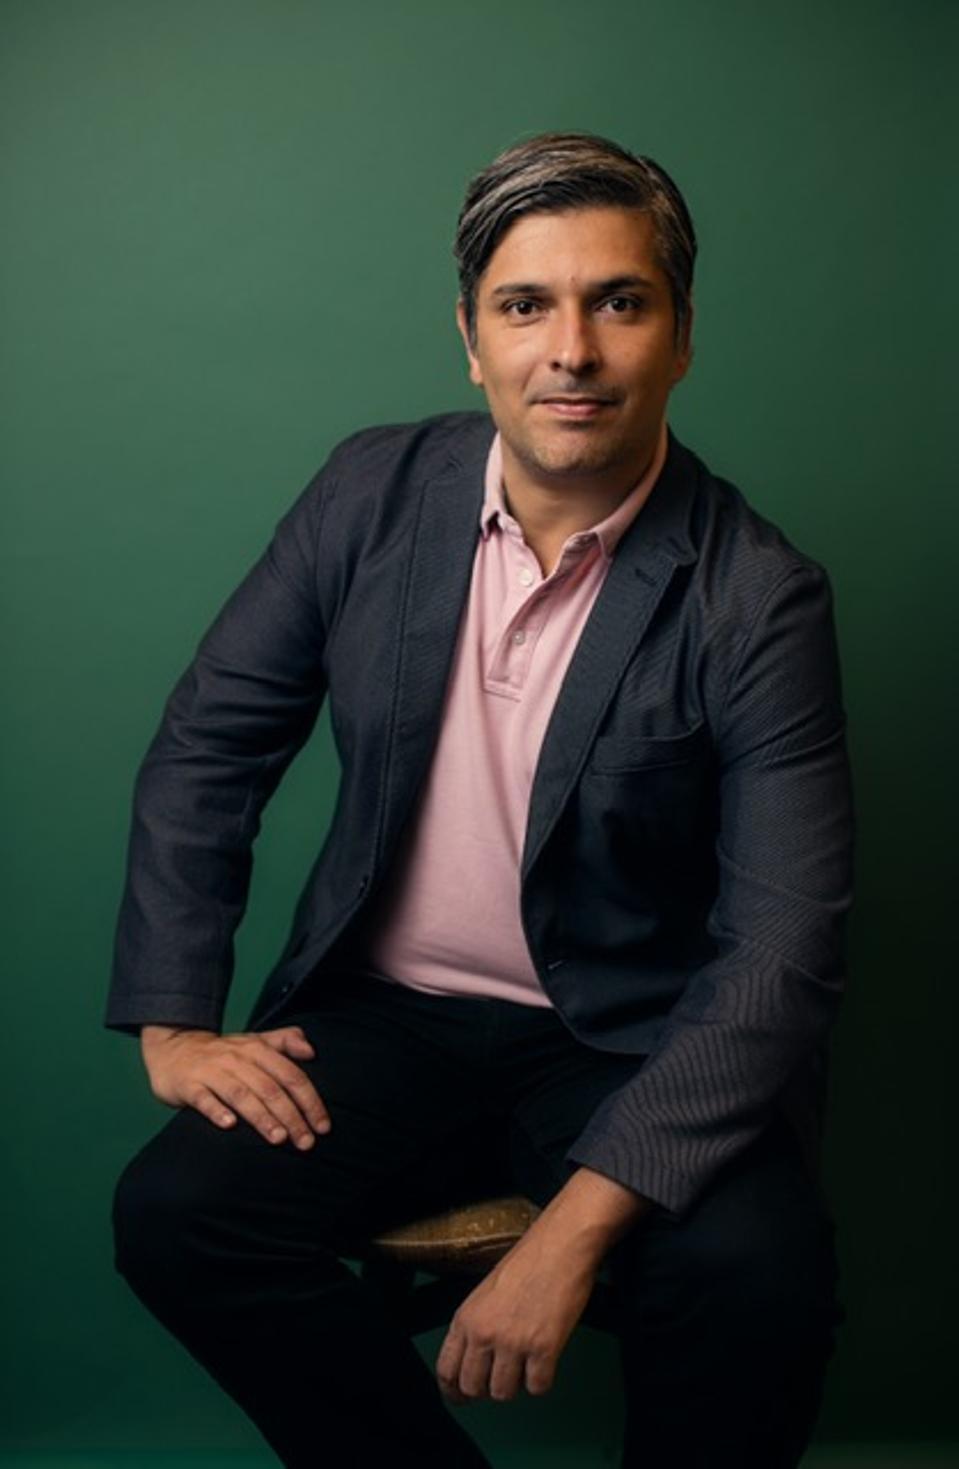 Fernando Machado, CMO of Restaurant Brands International and Burger King.